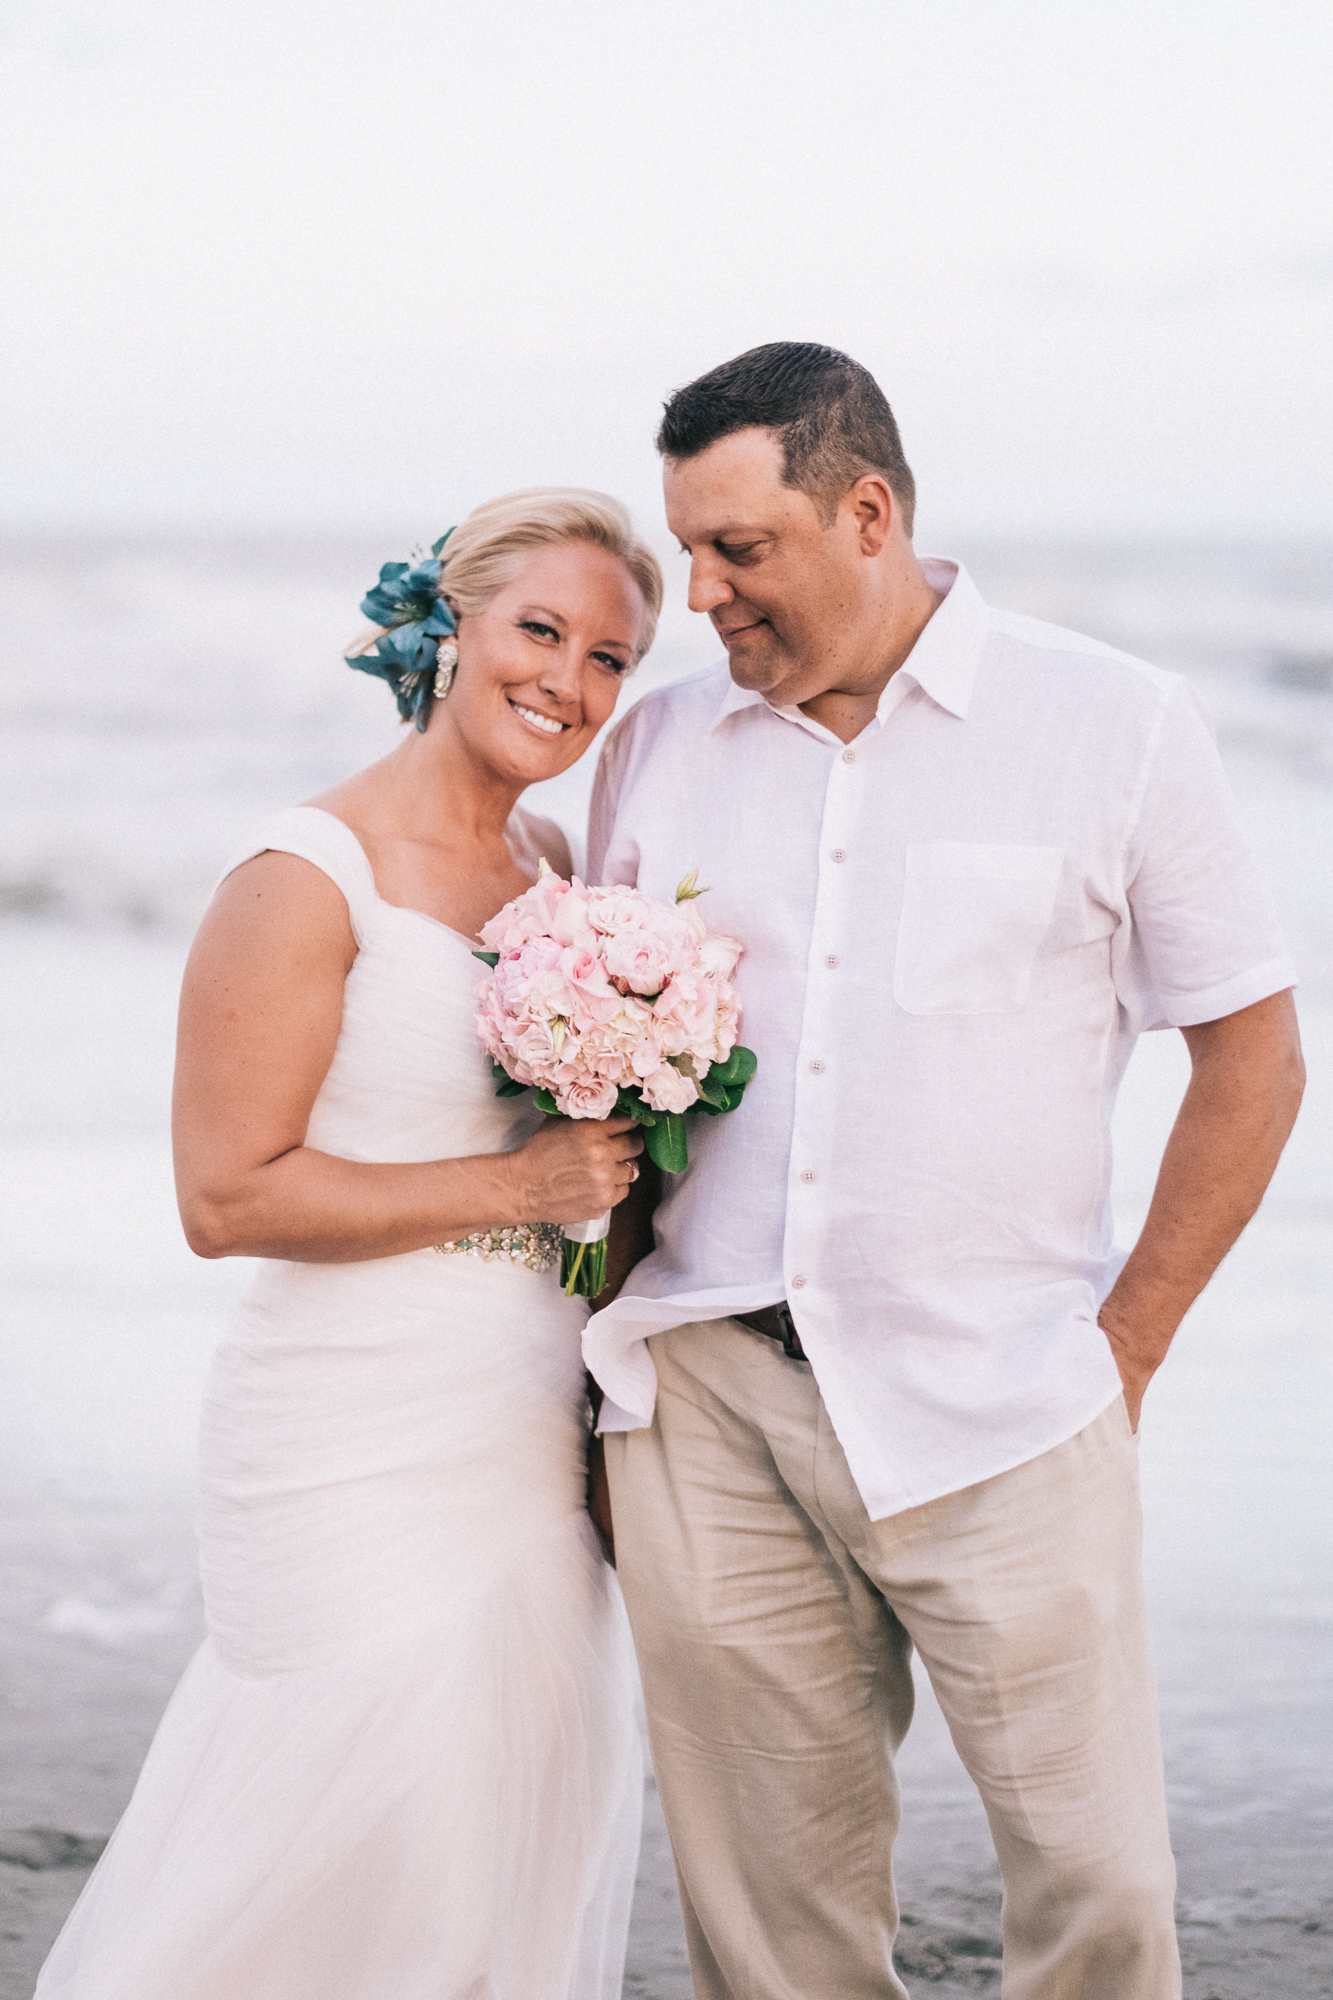 Stephanie-Mike-wedding-blog-22.jpg